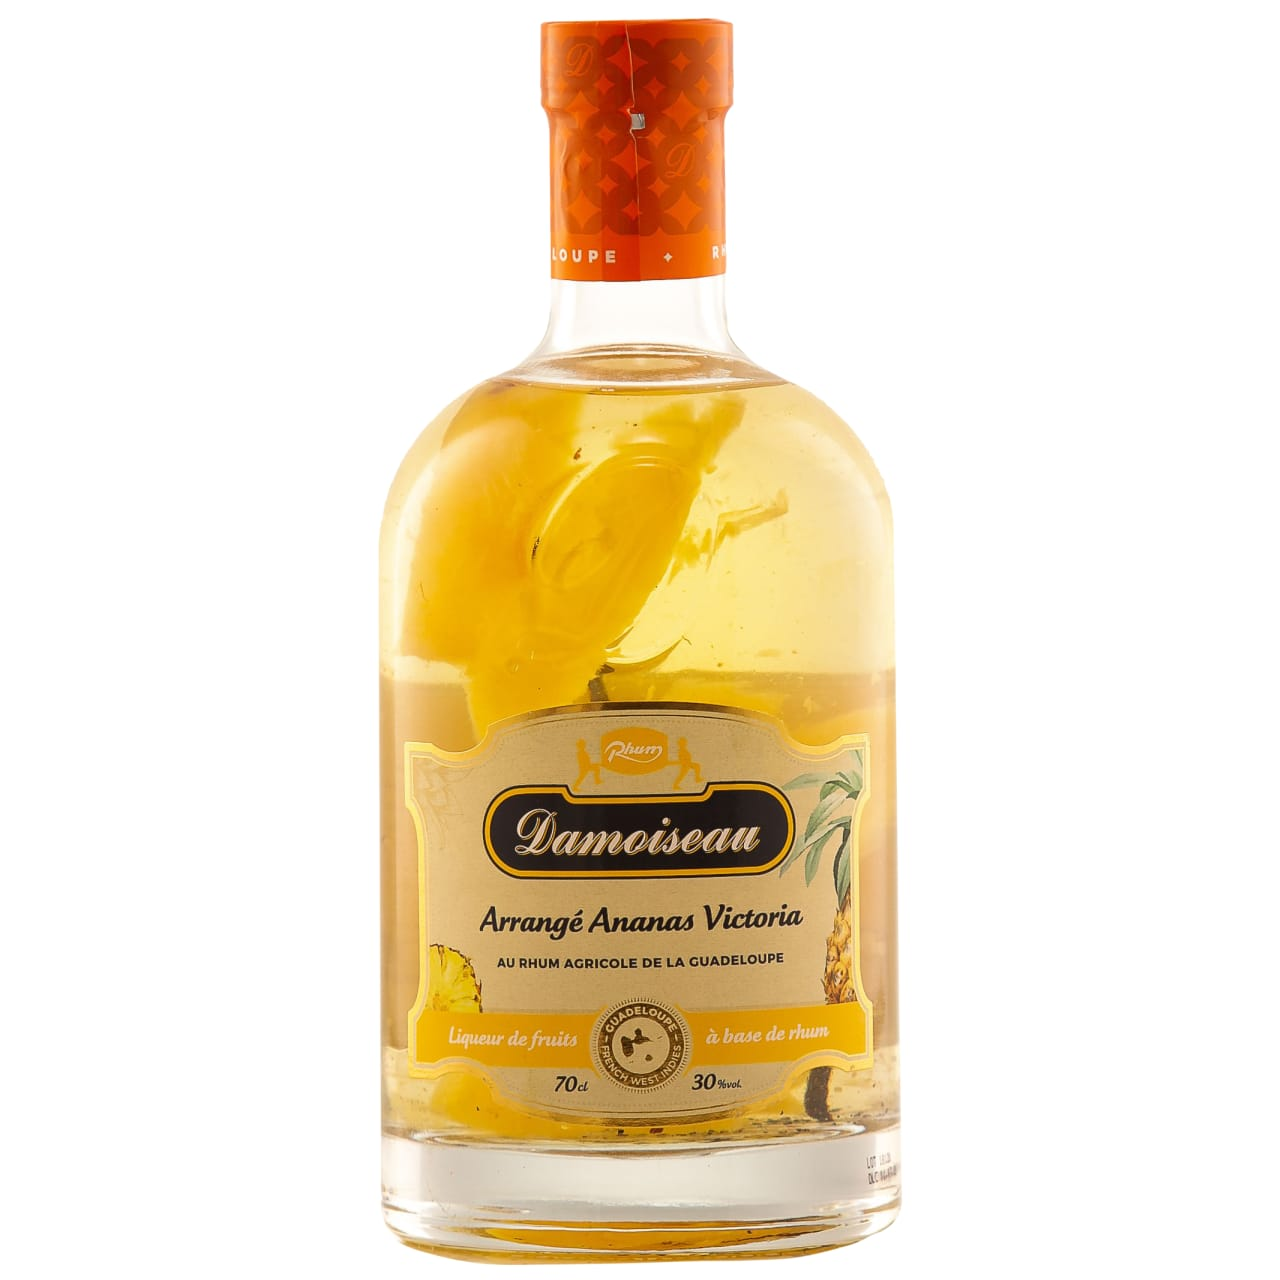 Product Image - Damoiseau Les Arrangés Pineapple & Vanilla Rum